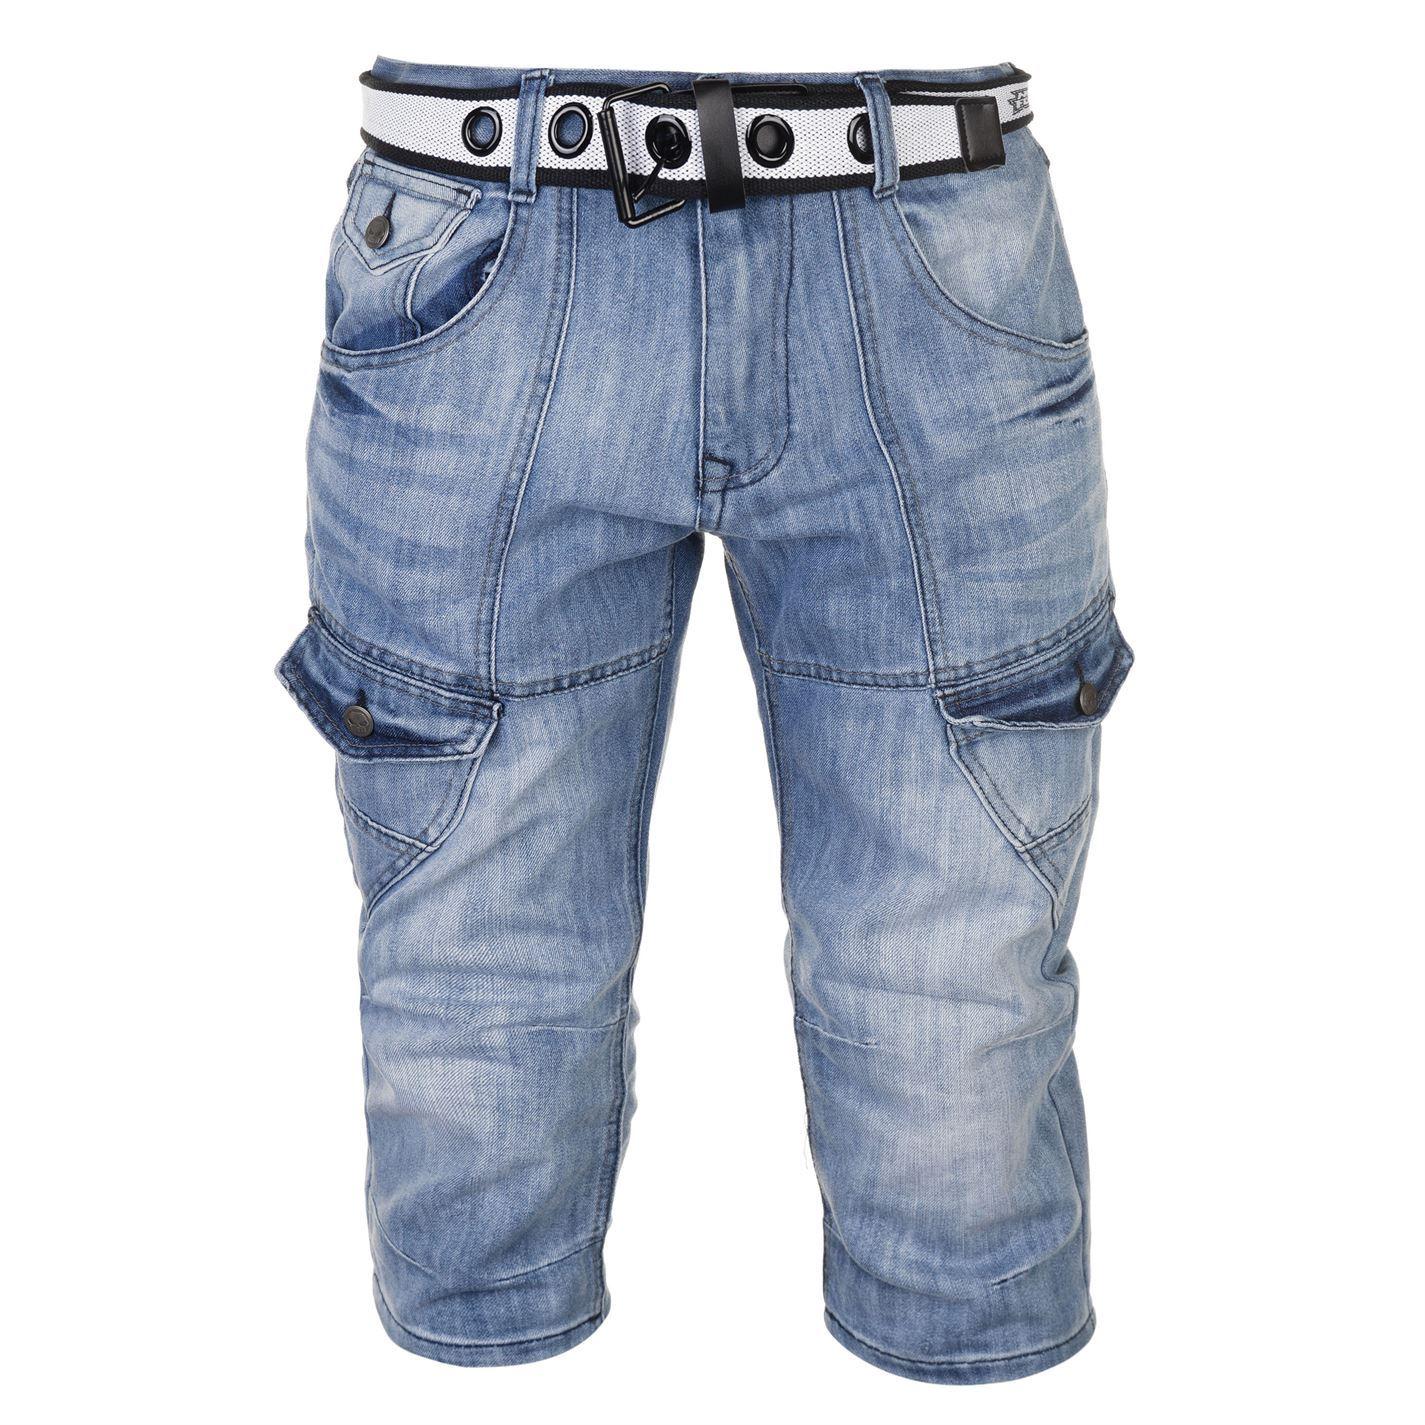 No-Fear-Belted-Cargo-Shorts-Mens-Bottoms-Short-Pants-Summerwear thumbnail 9